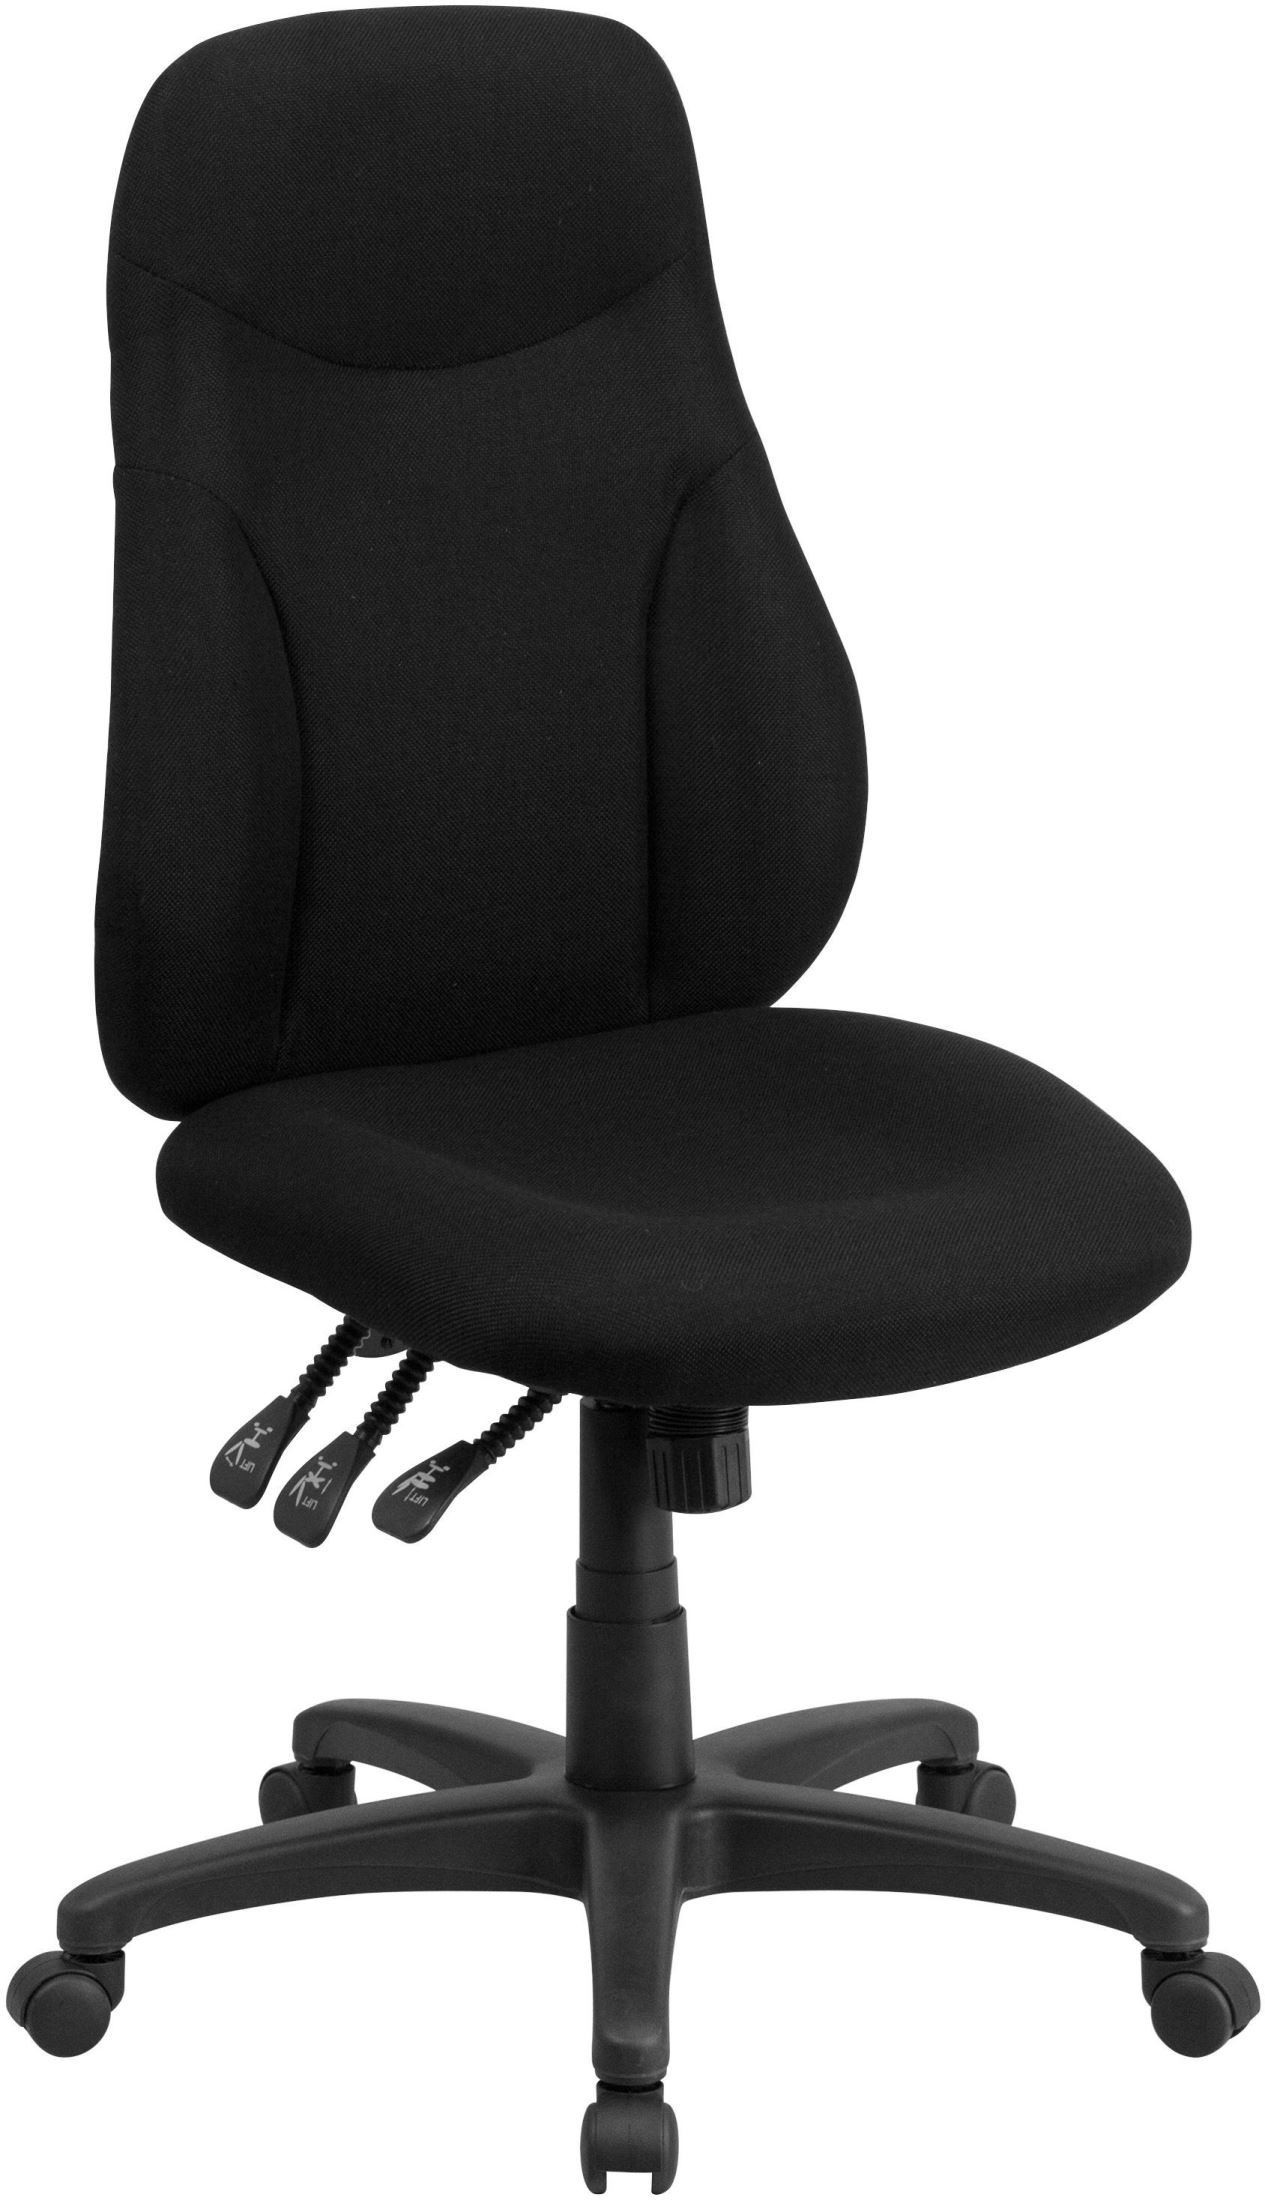 High Back Black Fabric Multi Functional Ergonomic Swivel Task Chair BT 90297